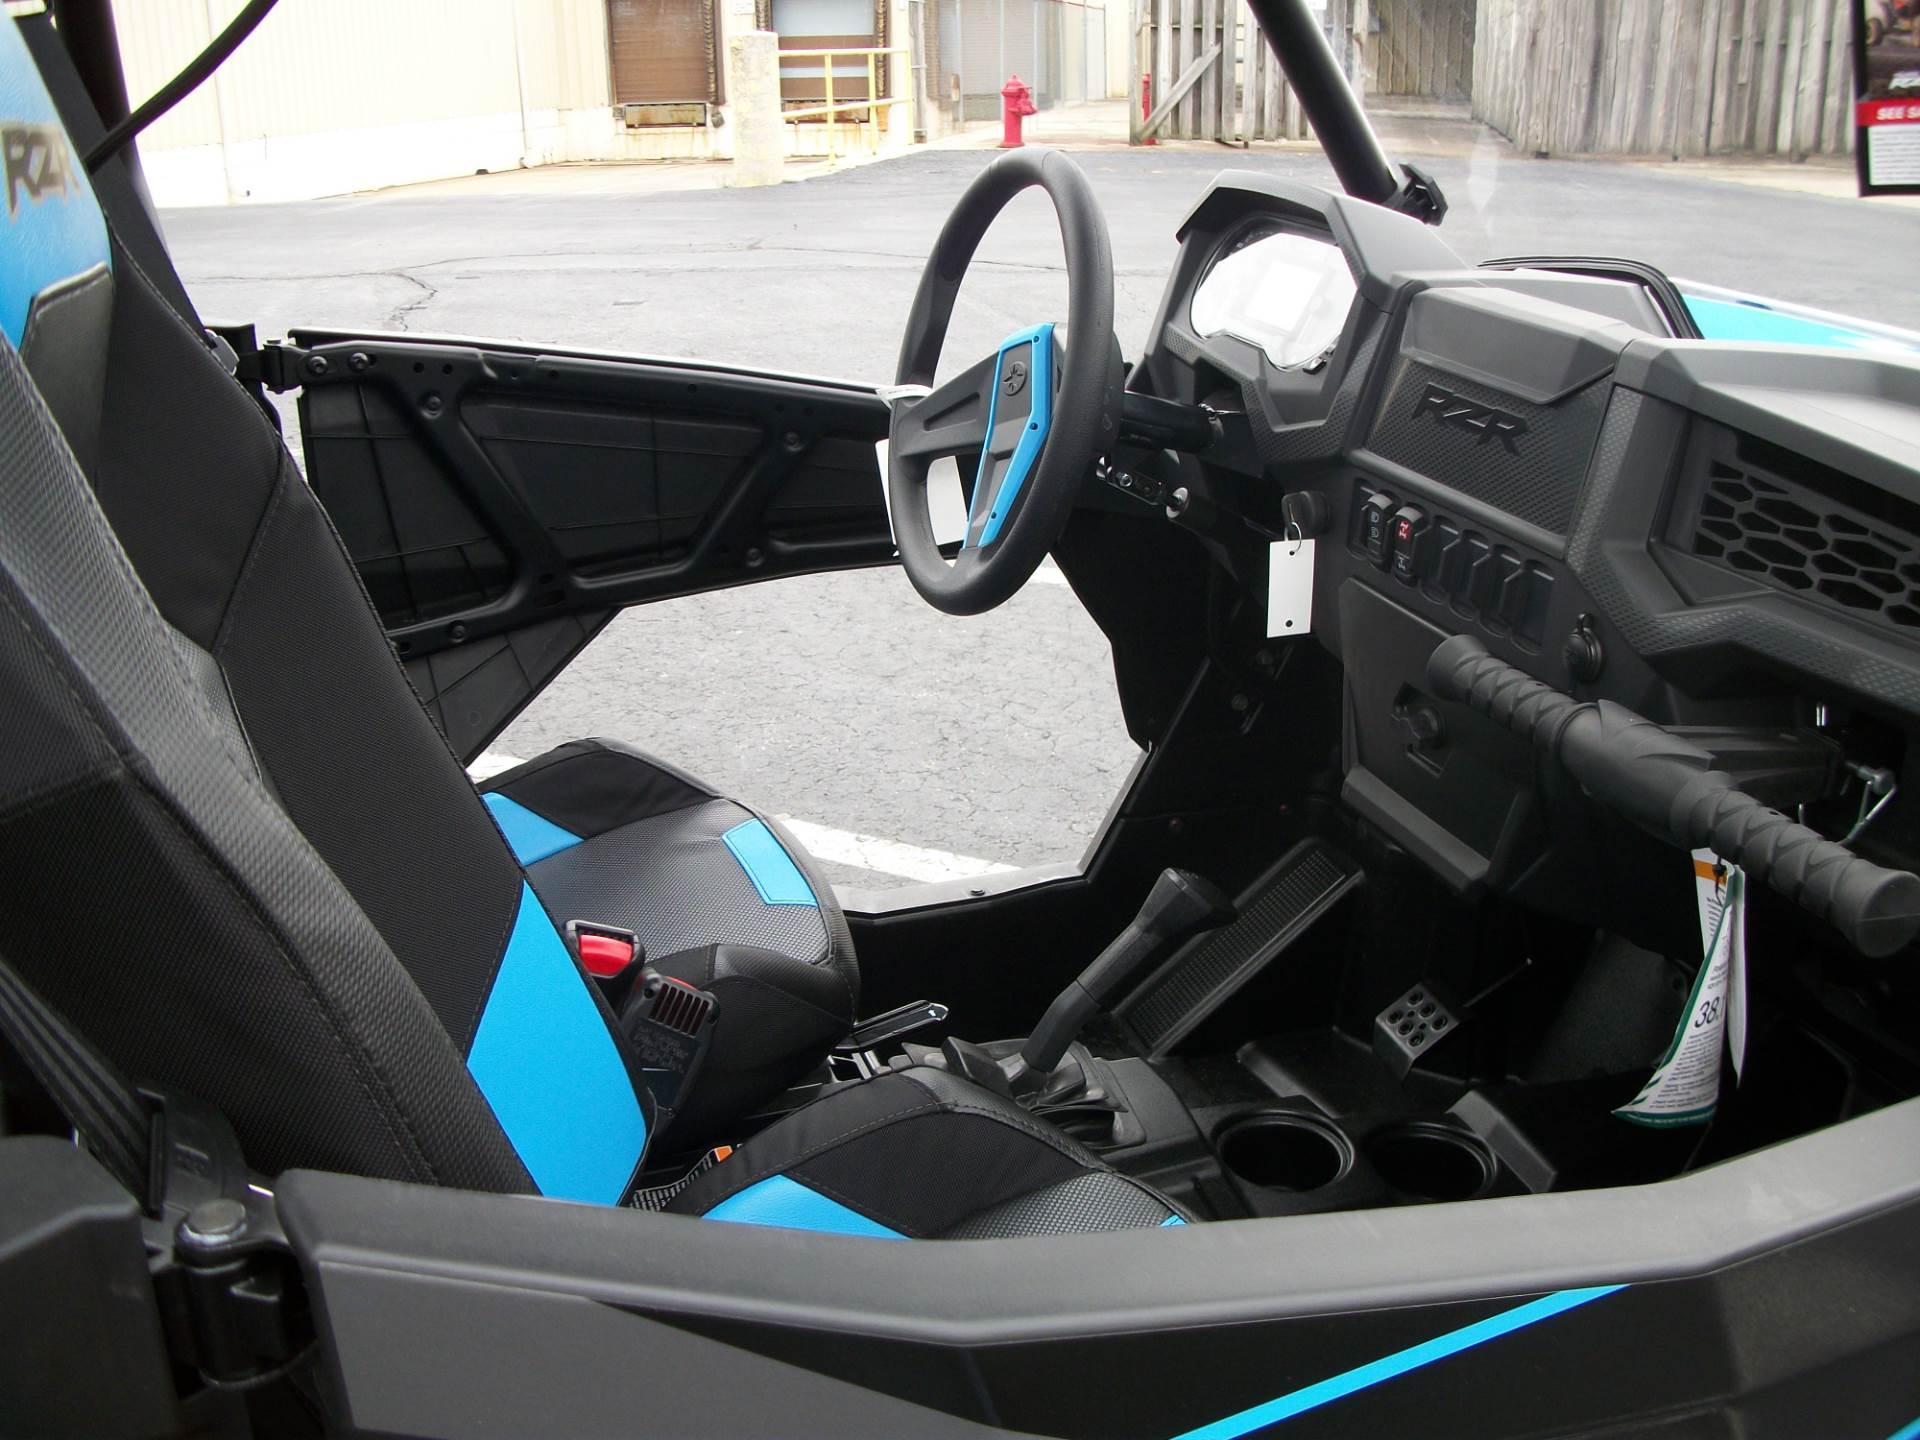 2019 Polaris RZR XP 4 Turbo in Statesville, North Carolina